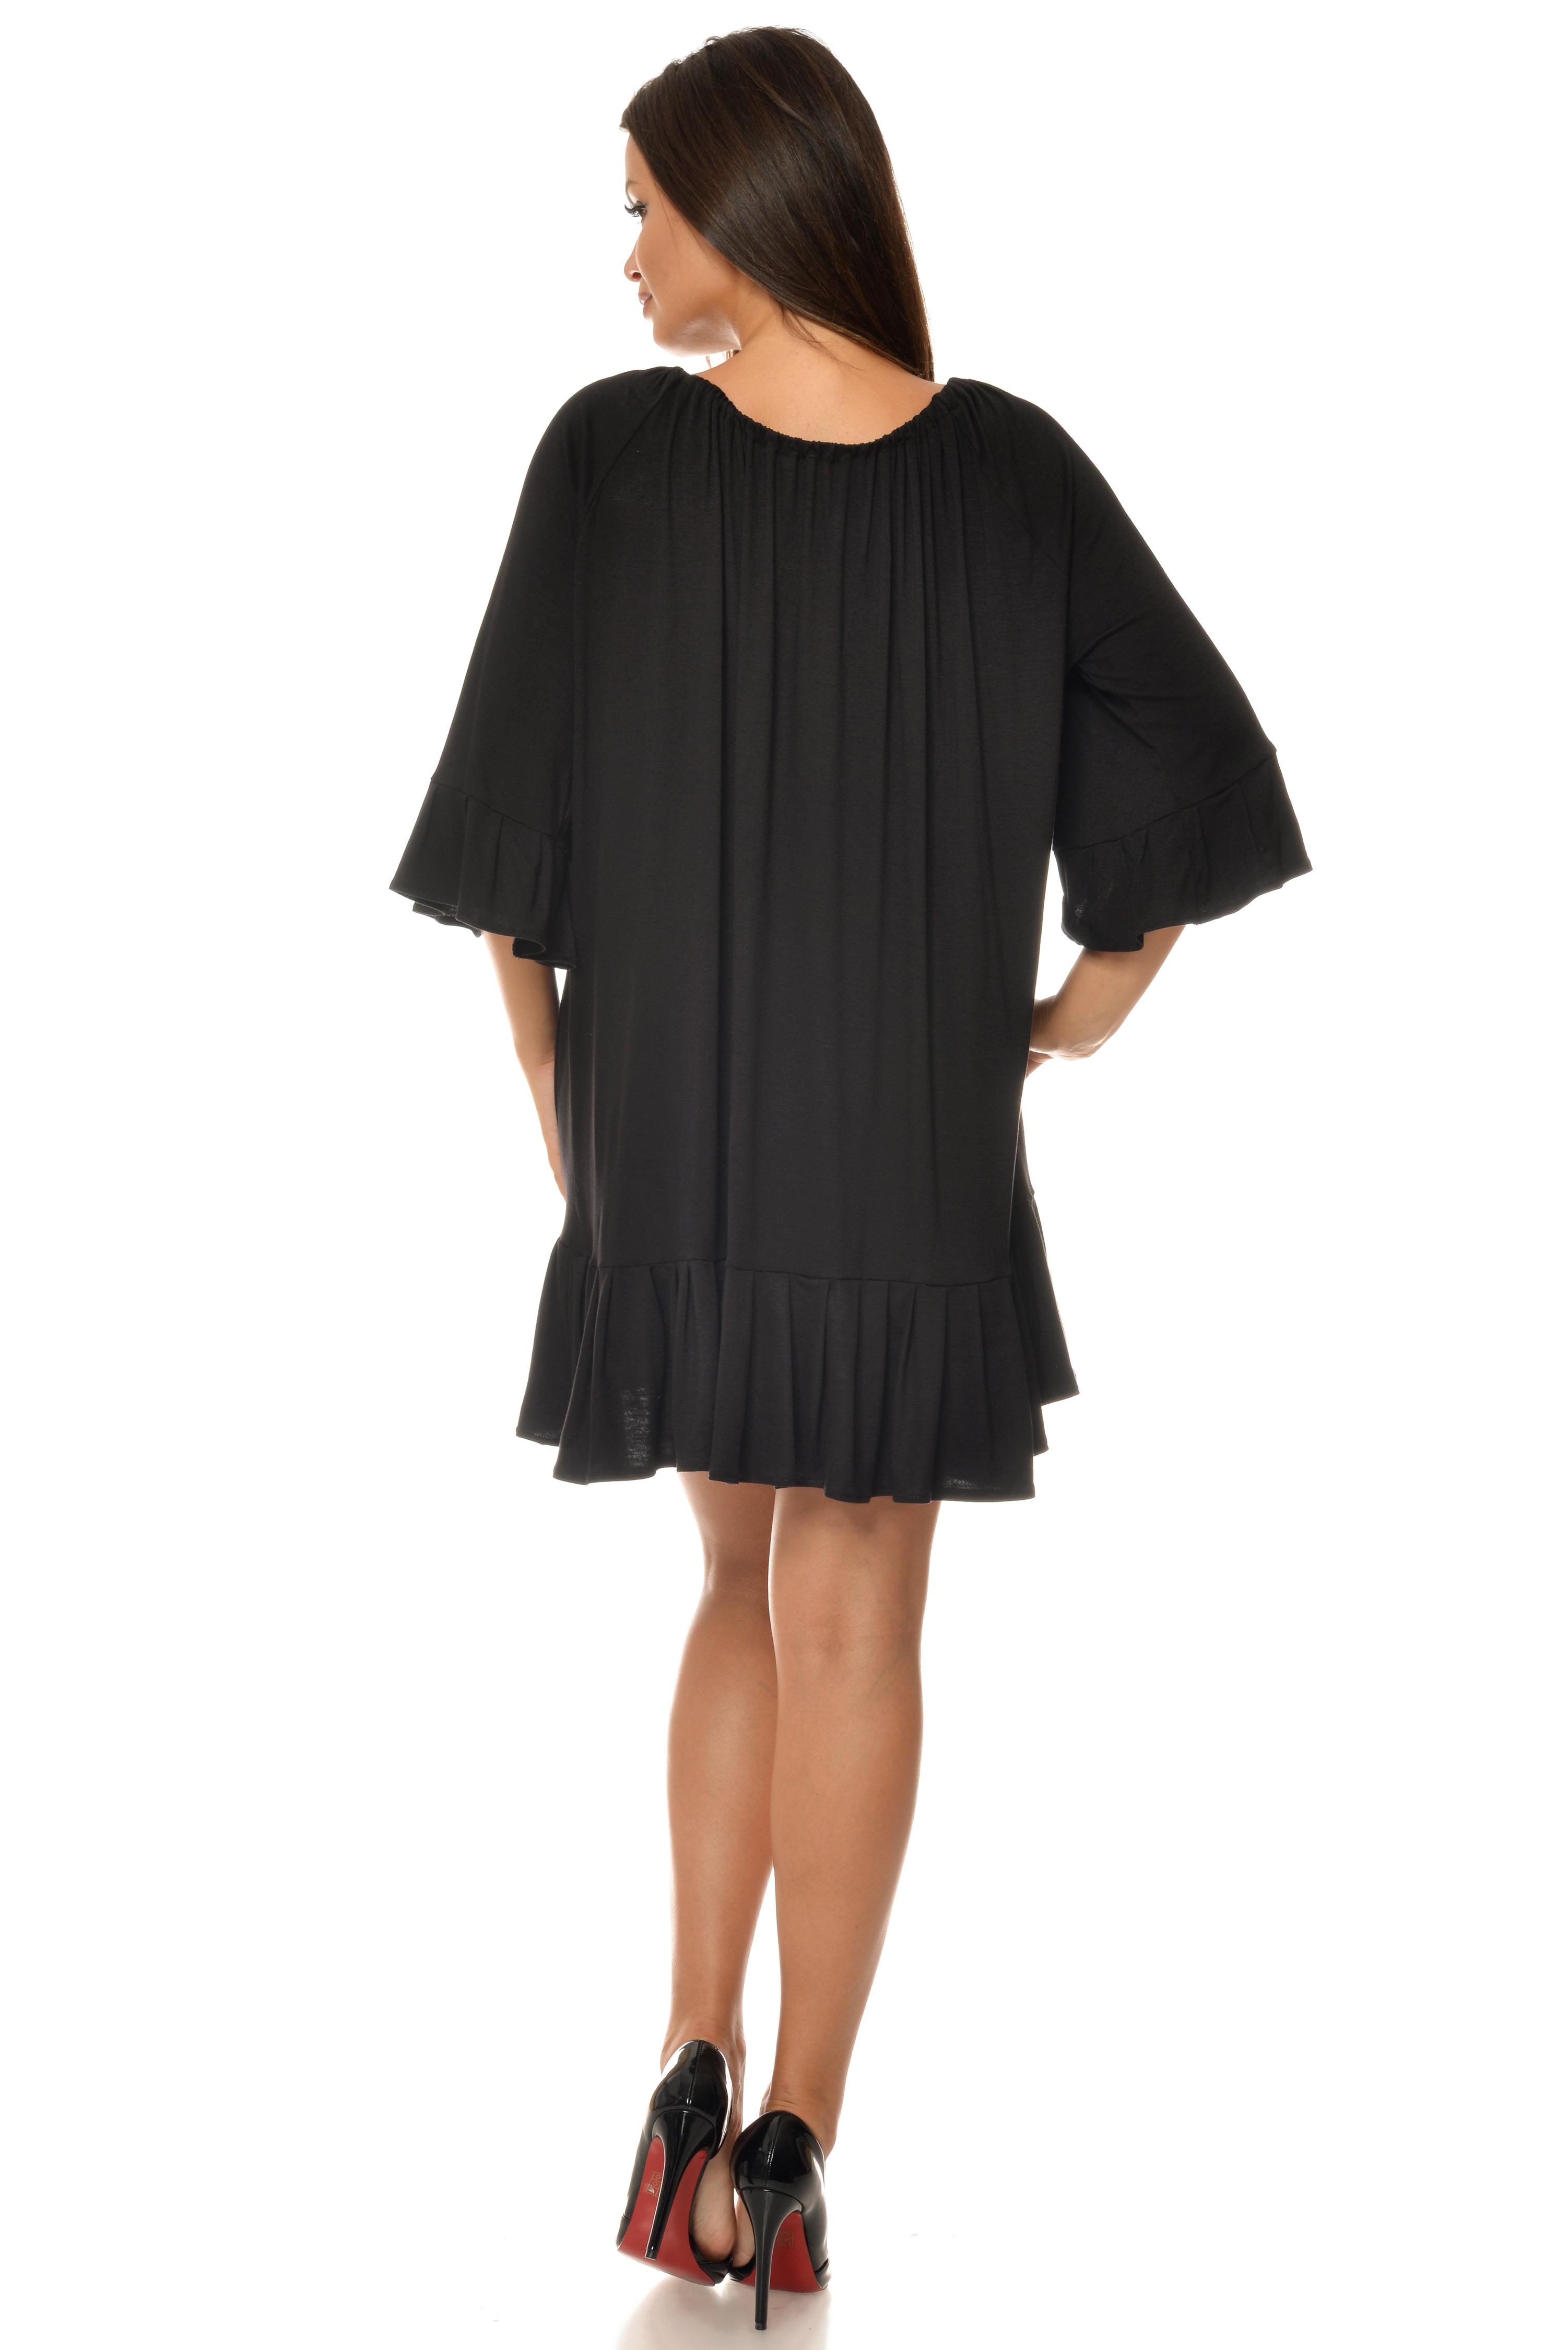 Rochie neagra oversize cu imprimeu etno aplicat CBM1019